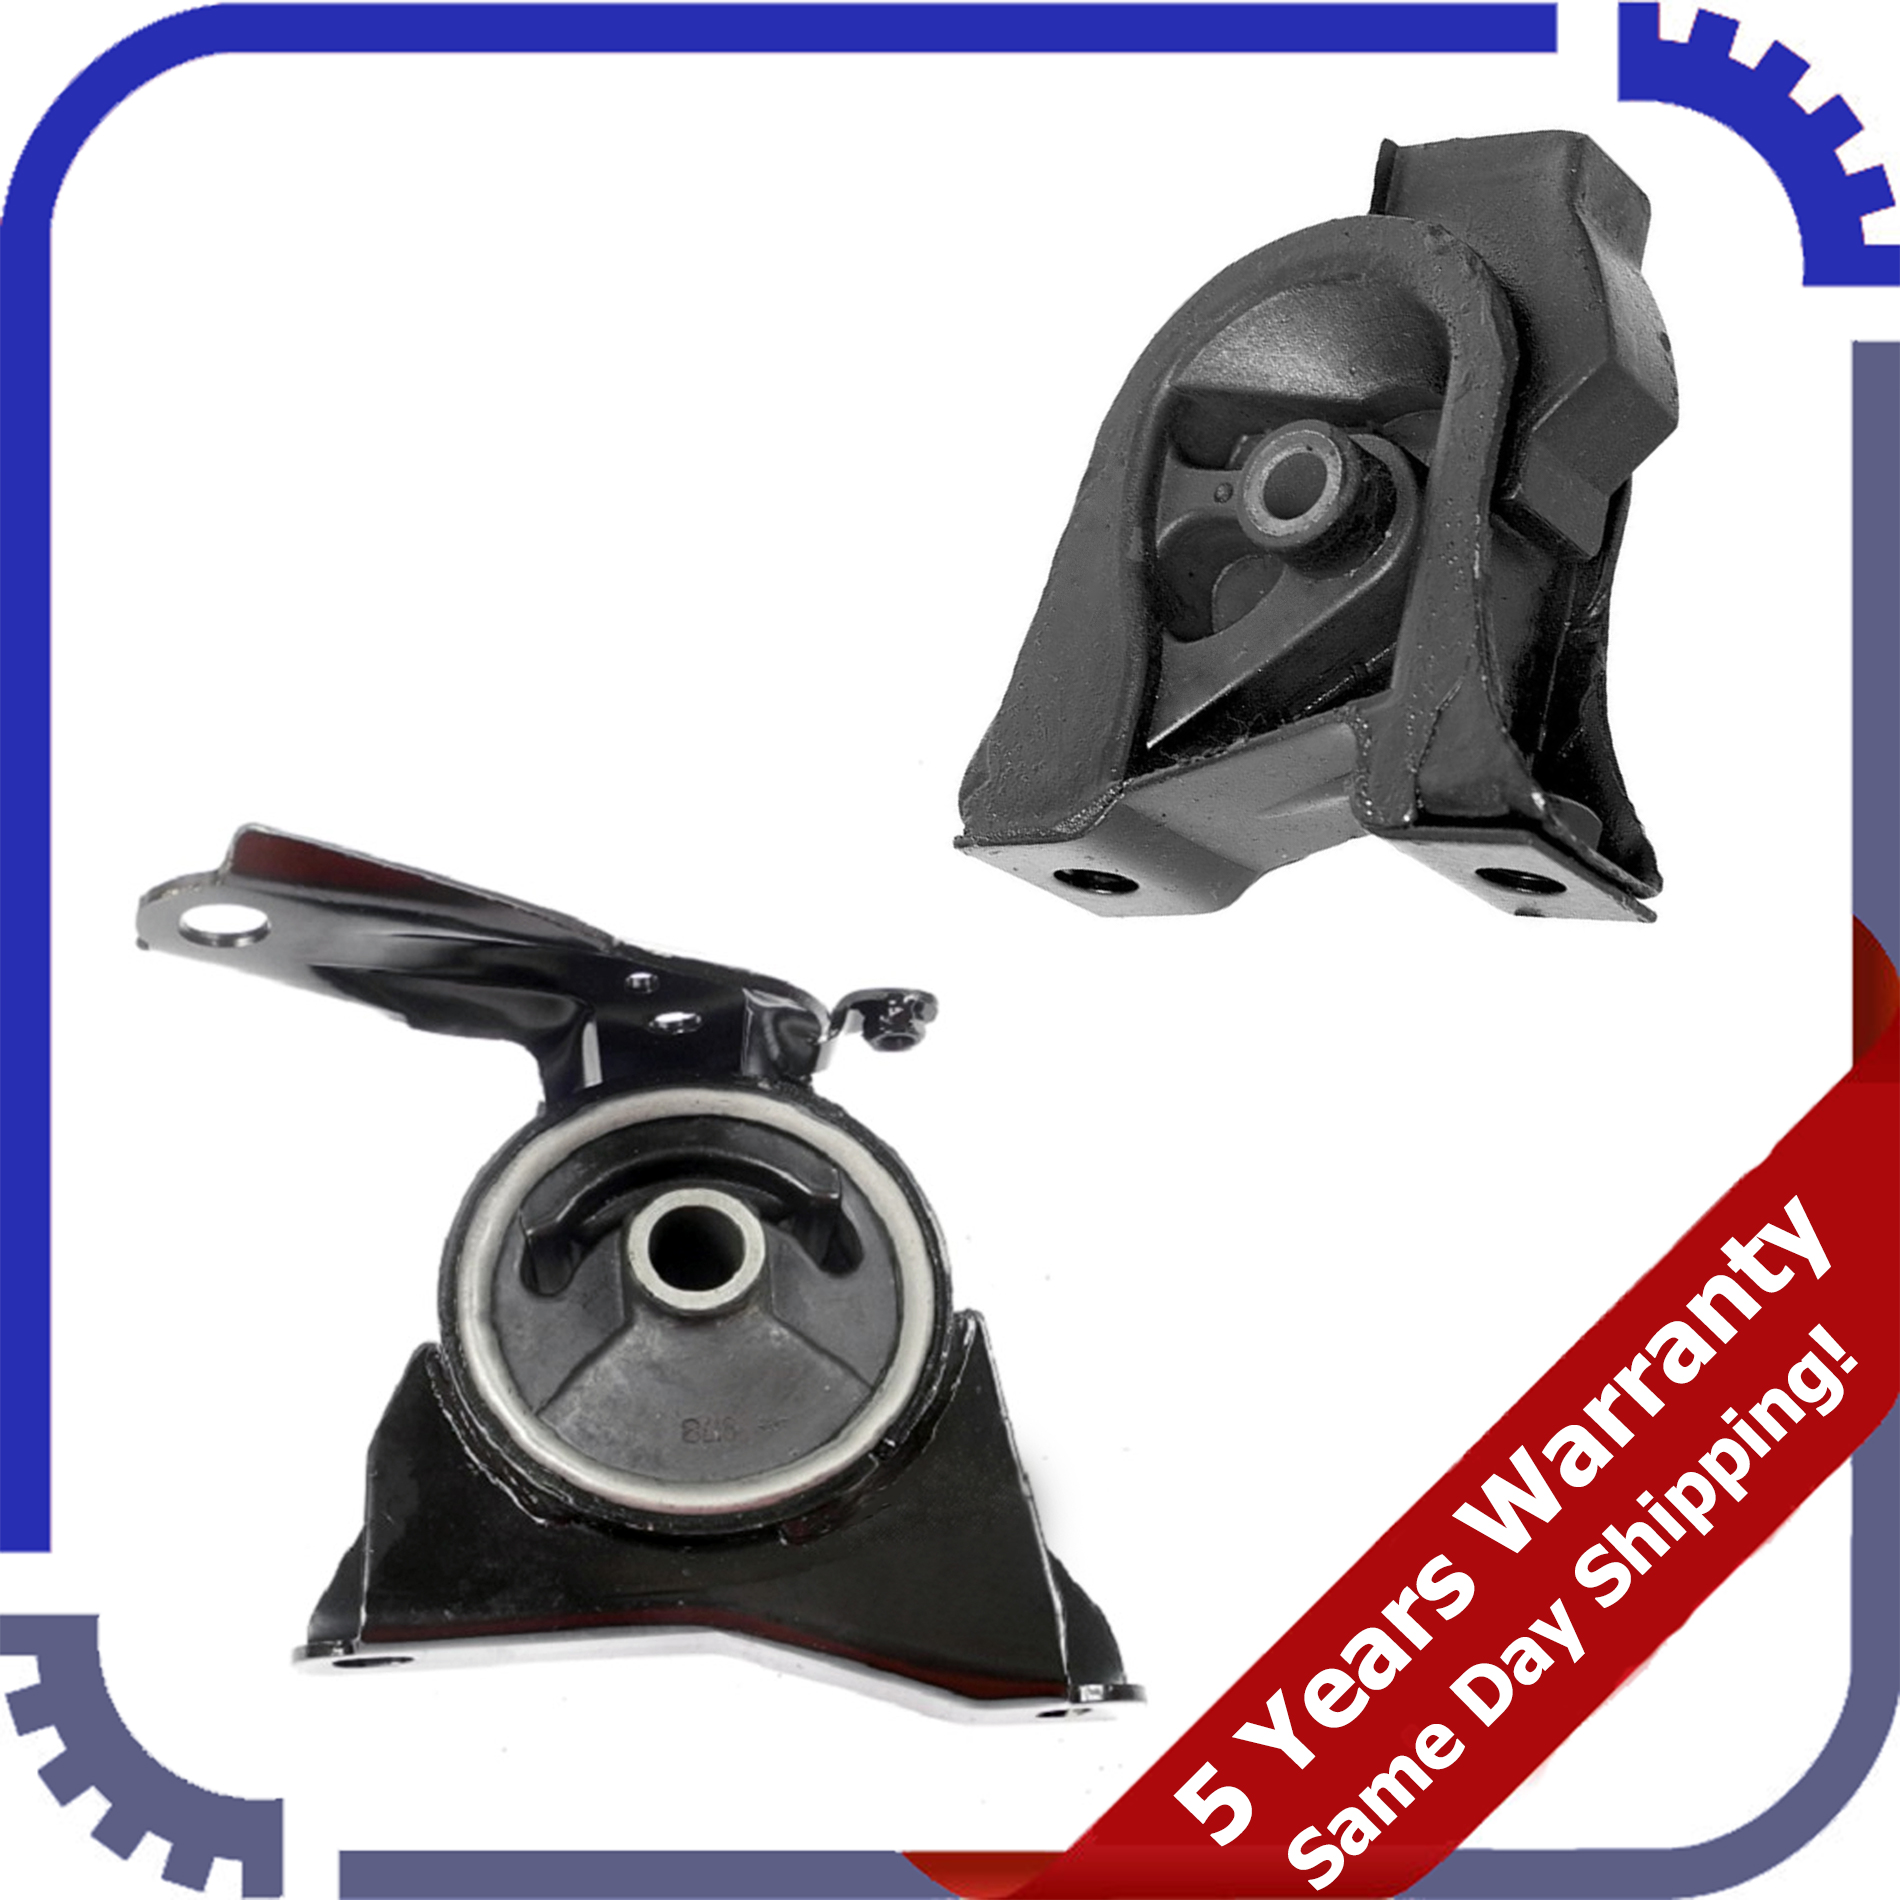 For 93-97 Toyota Corolla Base 1.6L FWD Engine Motor /& Transmission Mount Manual